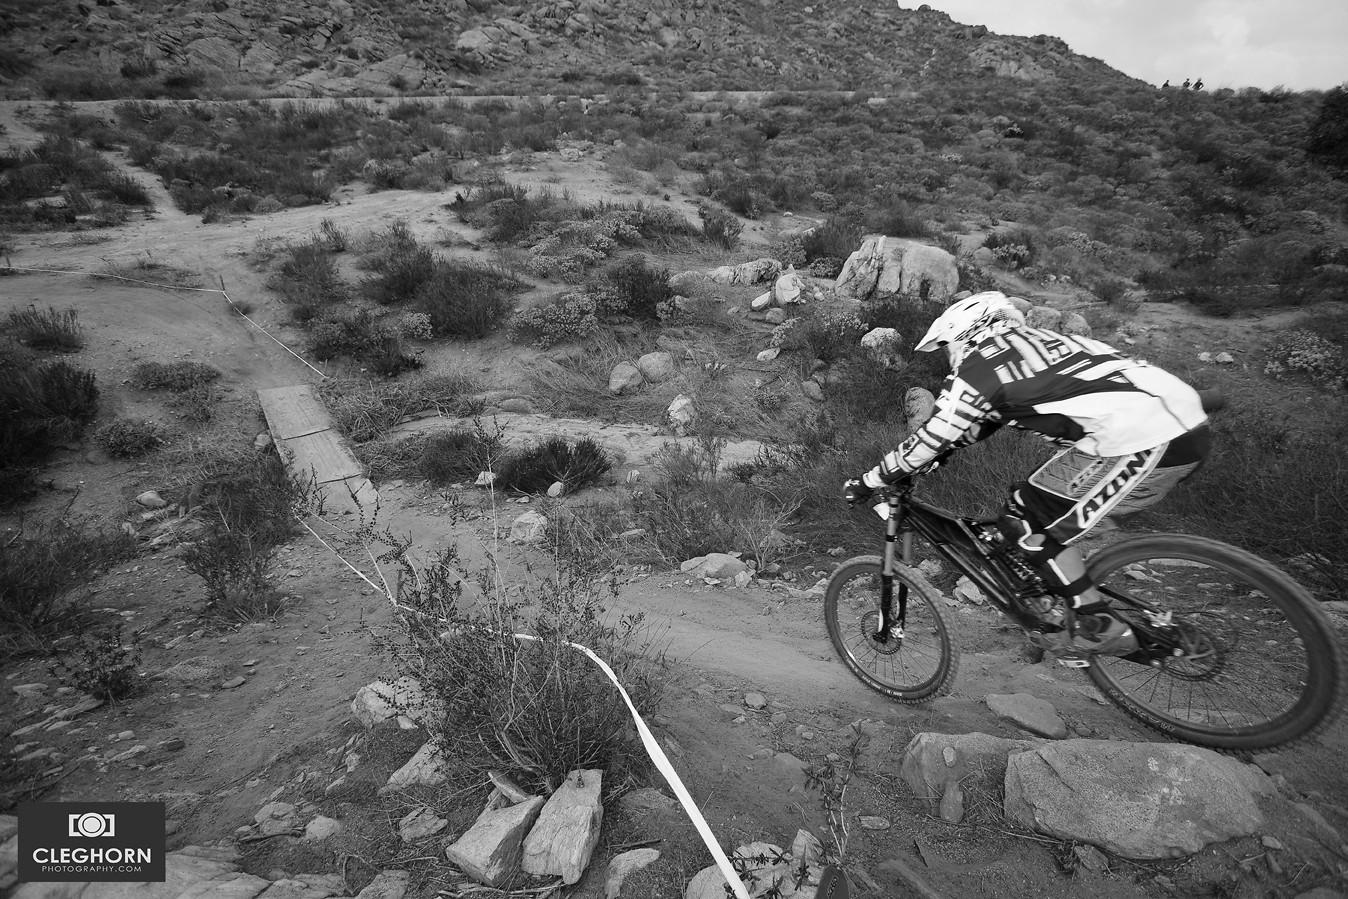 Downhill! - Cleghorn Photography - Mountain Biking Pictures - Vital MTB